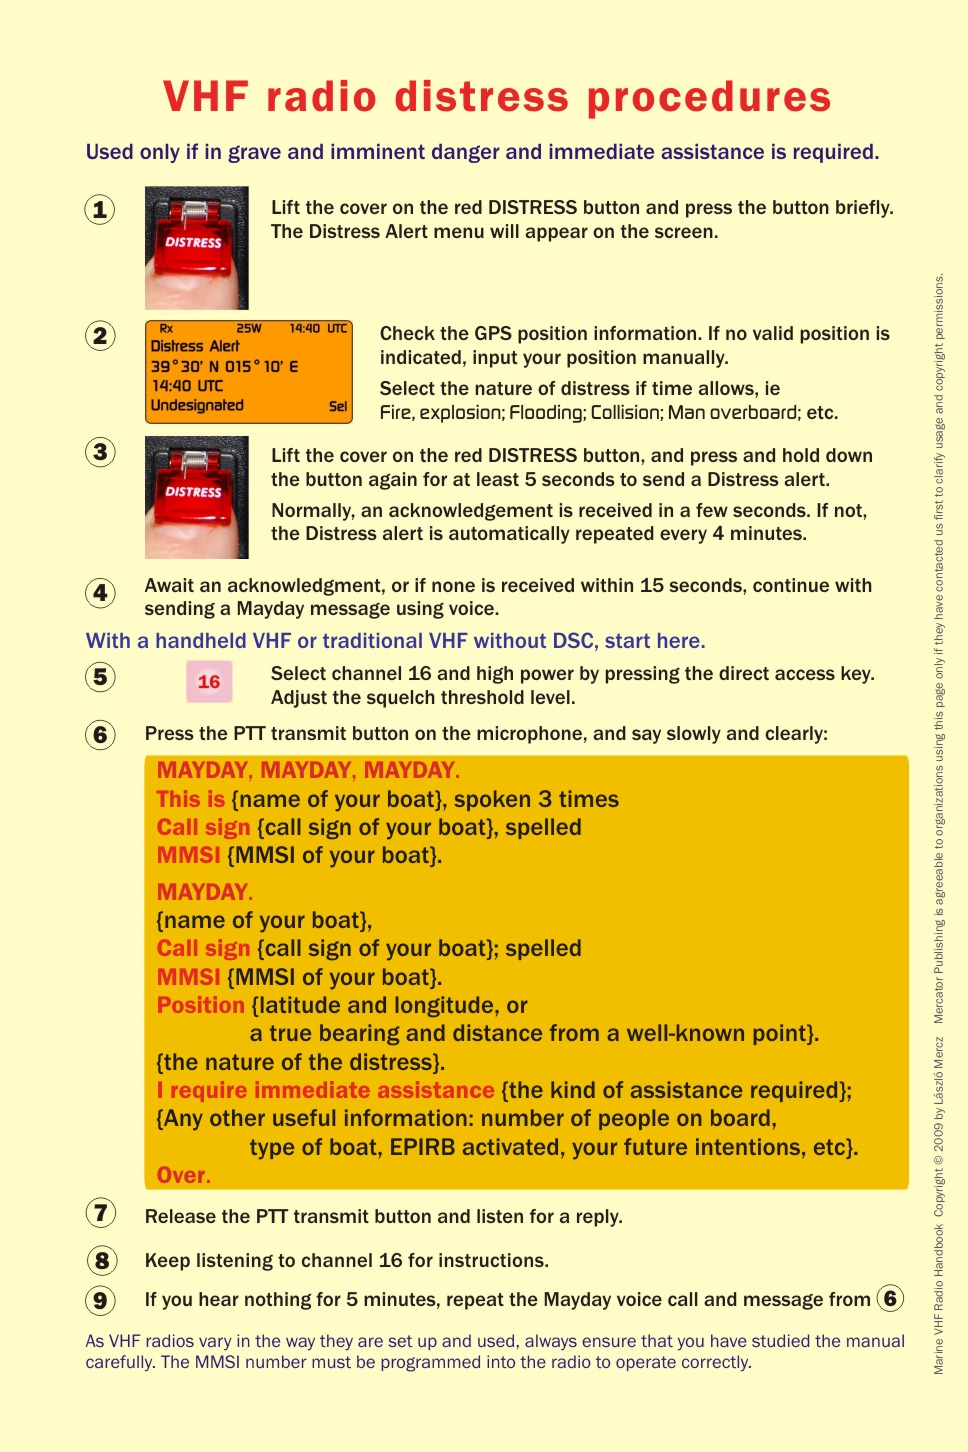 Click image for larger version  Name:VHF radio distress procedure.jpg Views:808 Size:356.4 KB ID:25470